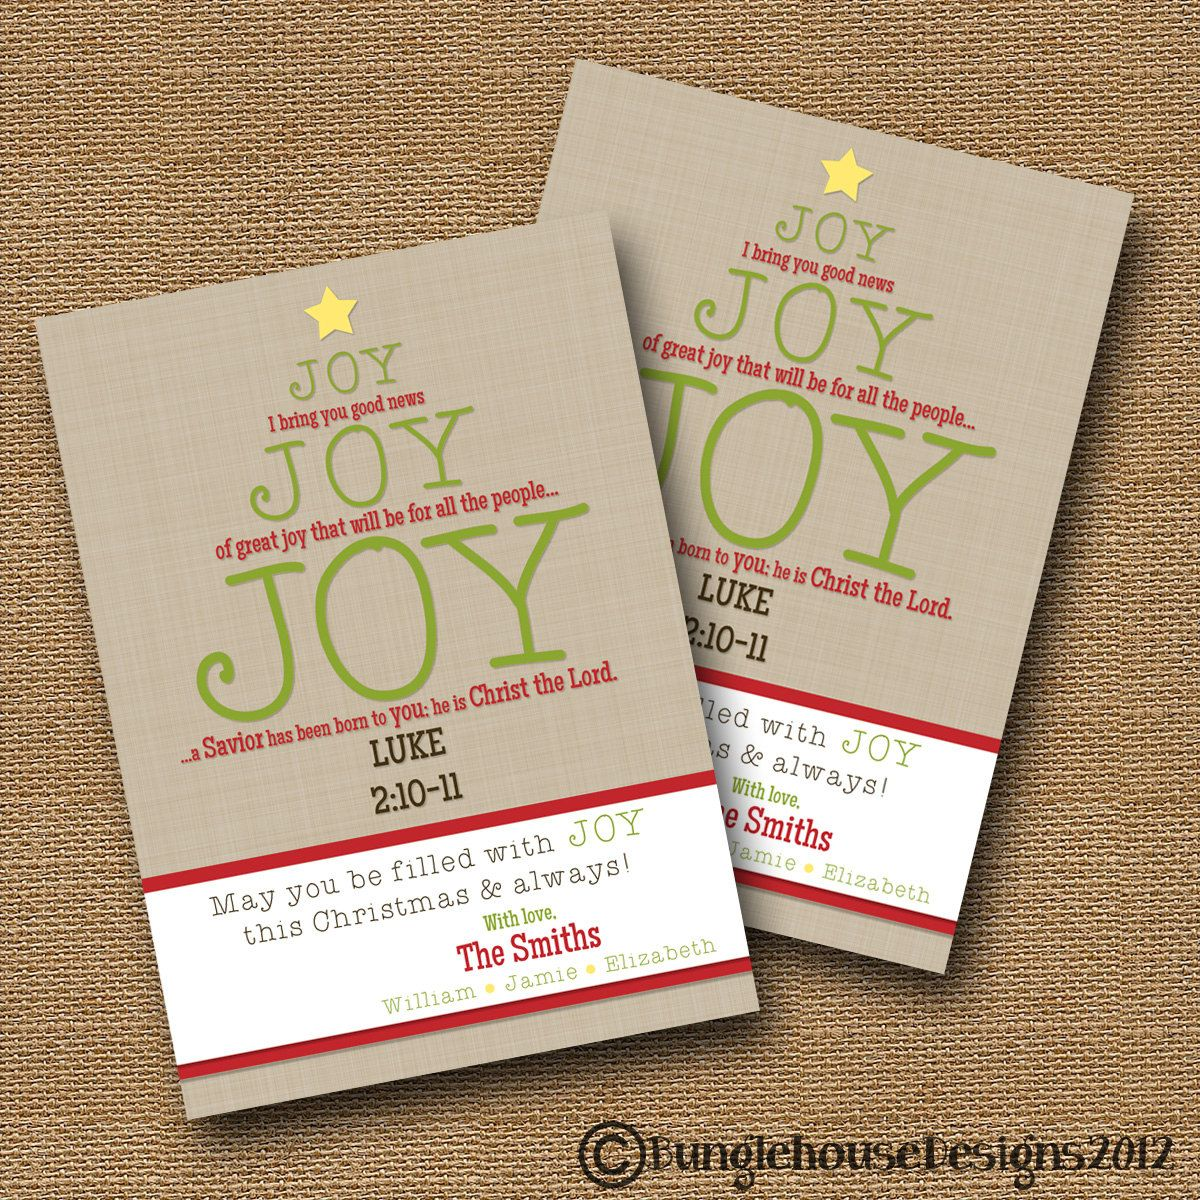 Christmas card diy printable joy joy joy christian scripture christmas card diy printable joy joy joy scripture bible verse christmas card 1200 via etsy m4hsunfo